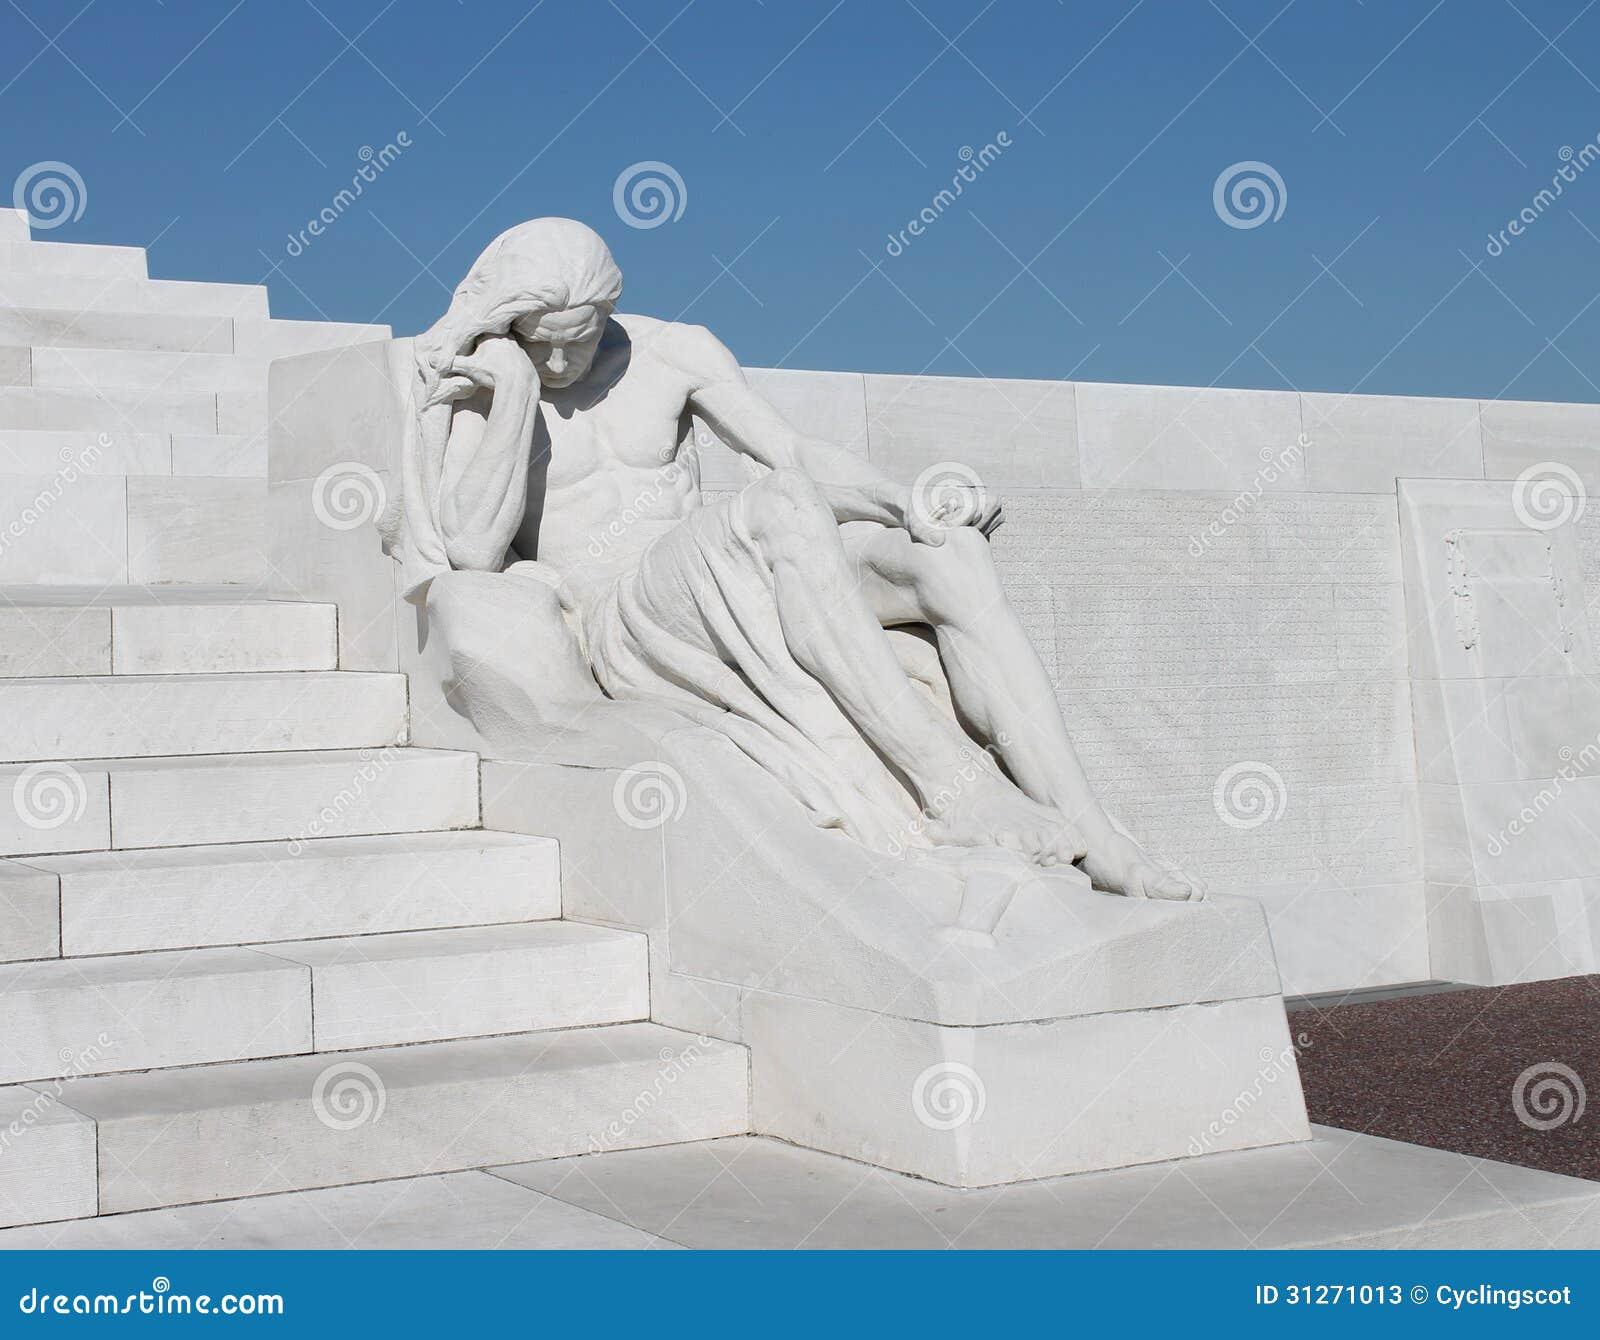 Vimy Ridge Memorial Park: Grieving Figure Sculpture At Canadian Vimy Ridge Memorial